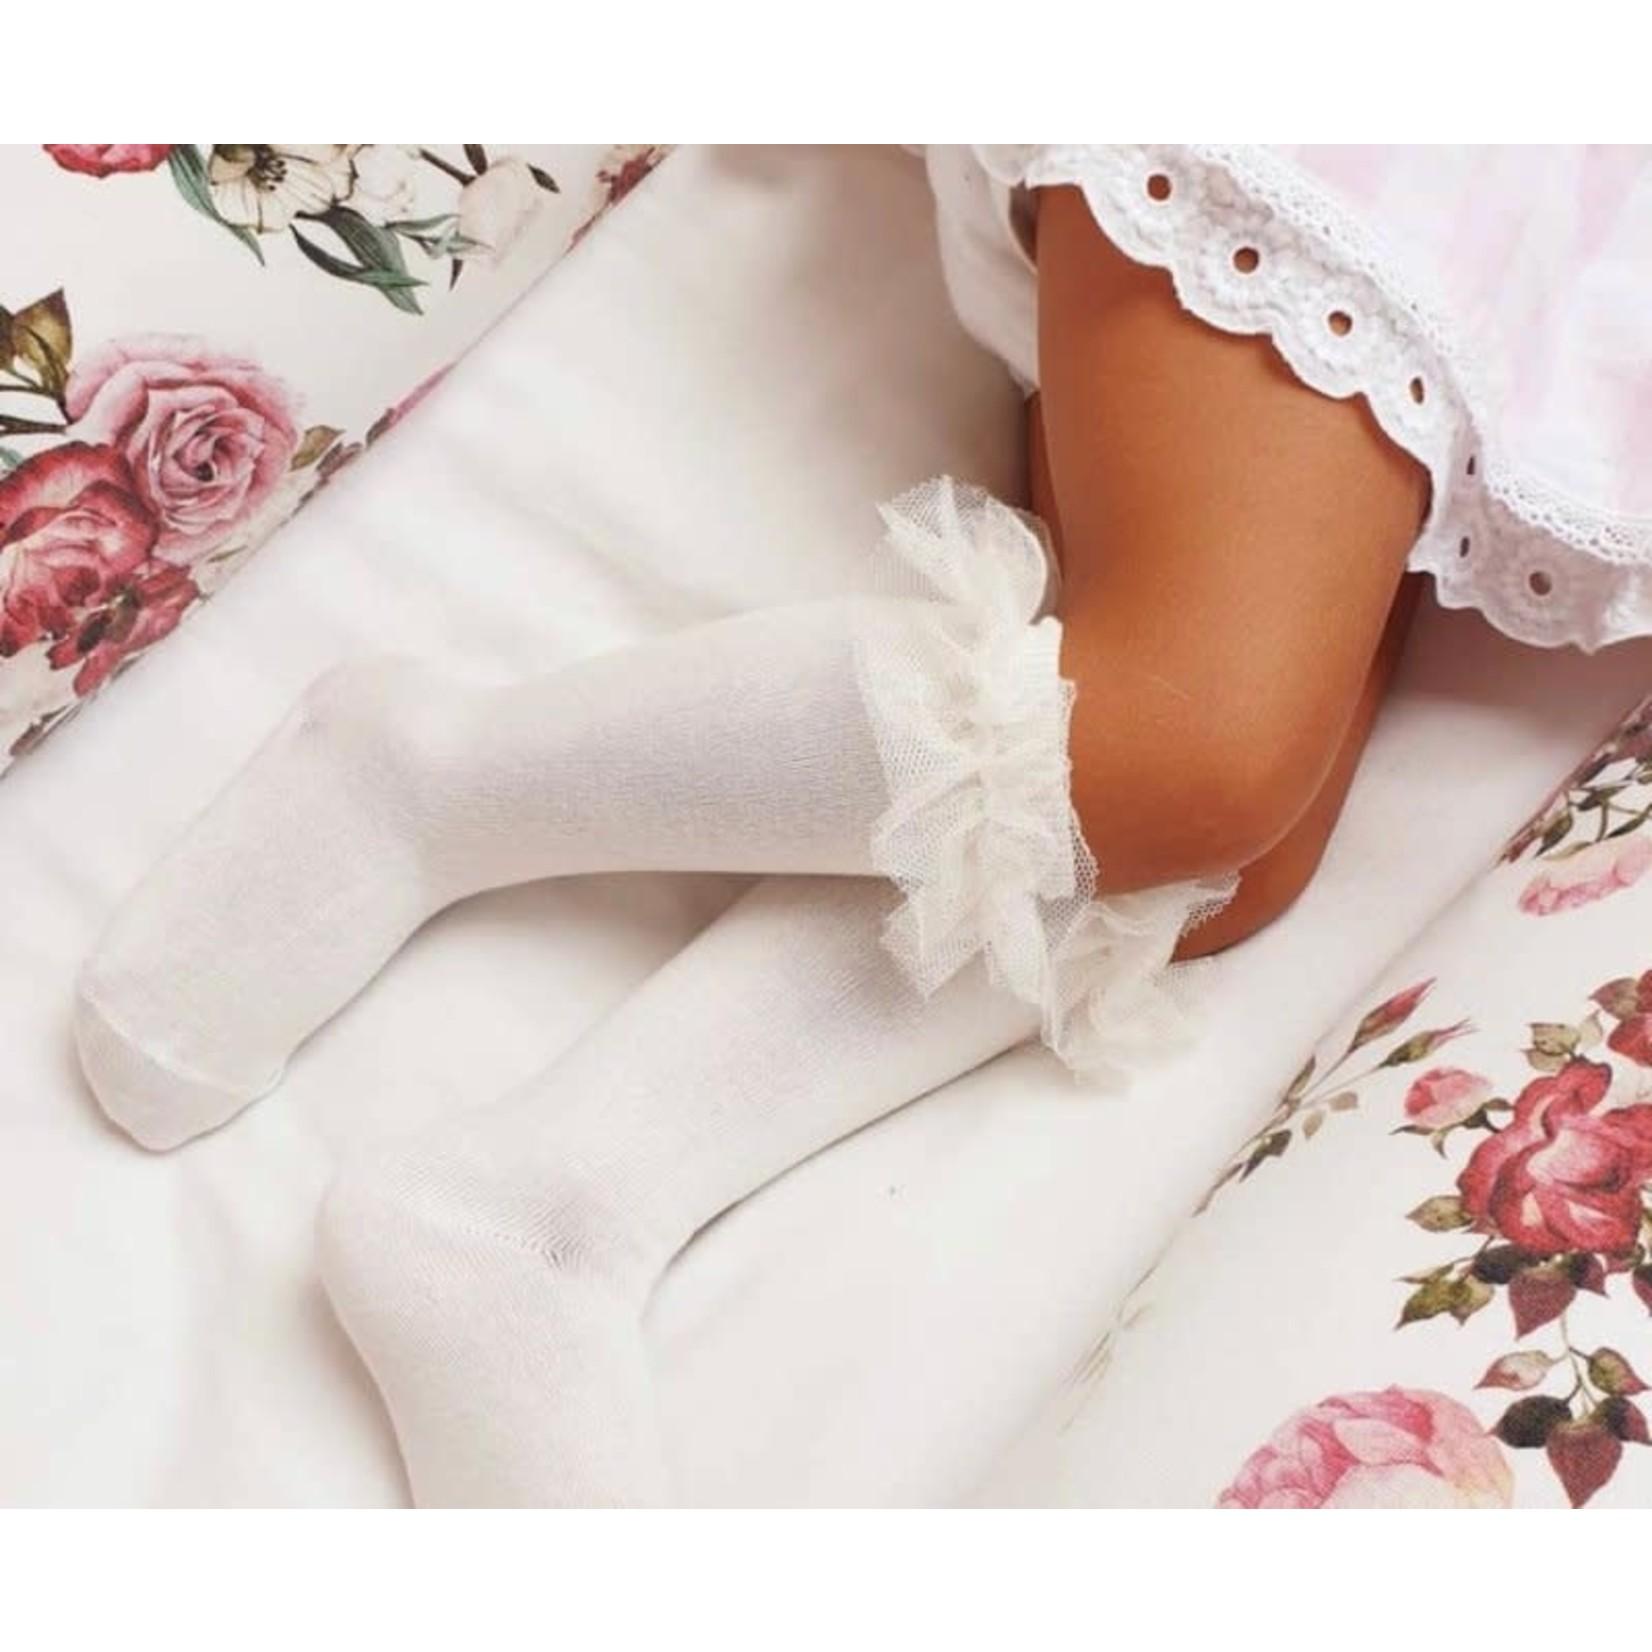 Condor Ruffle Socks Knee High - Cream